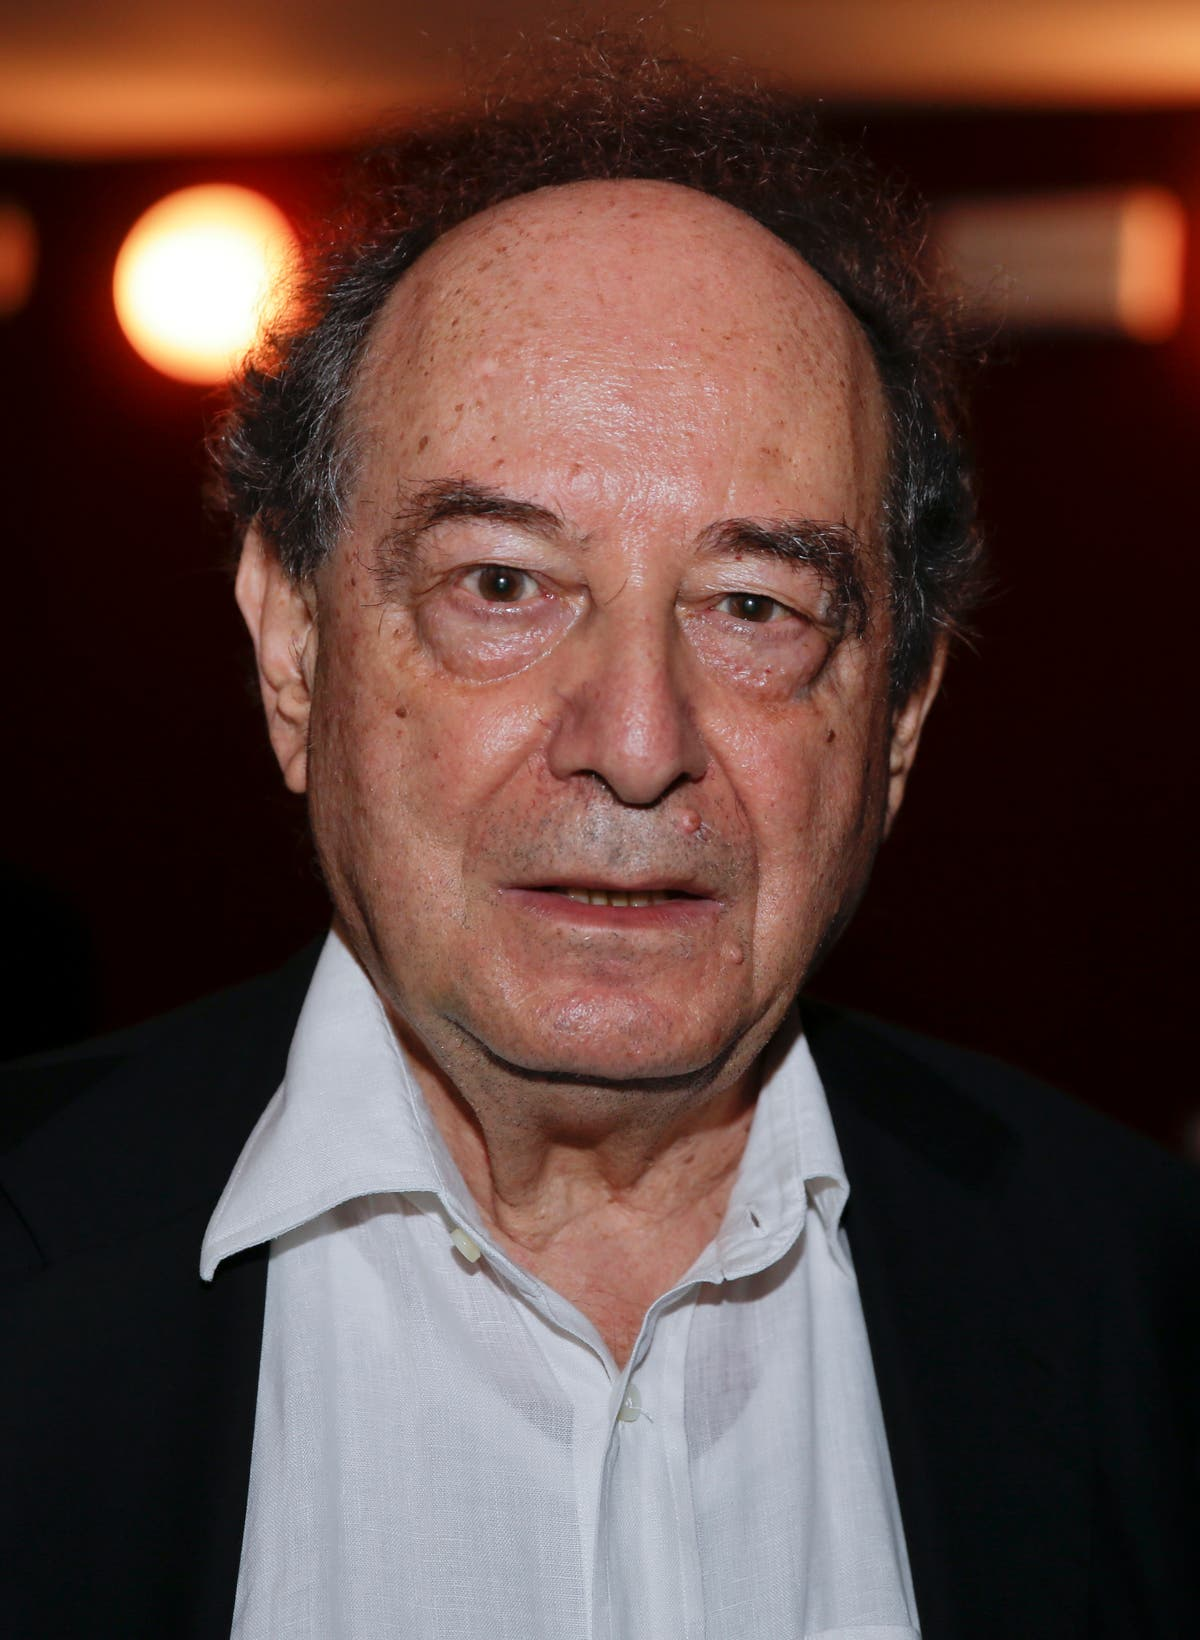 Roberto Calasso, Italian publisher and literary figure, 死了